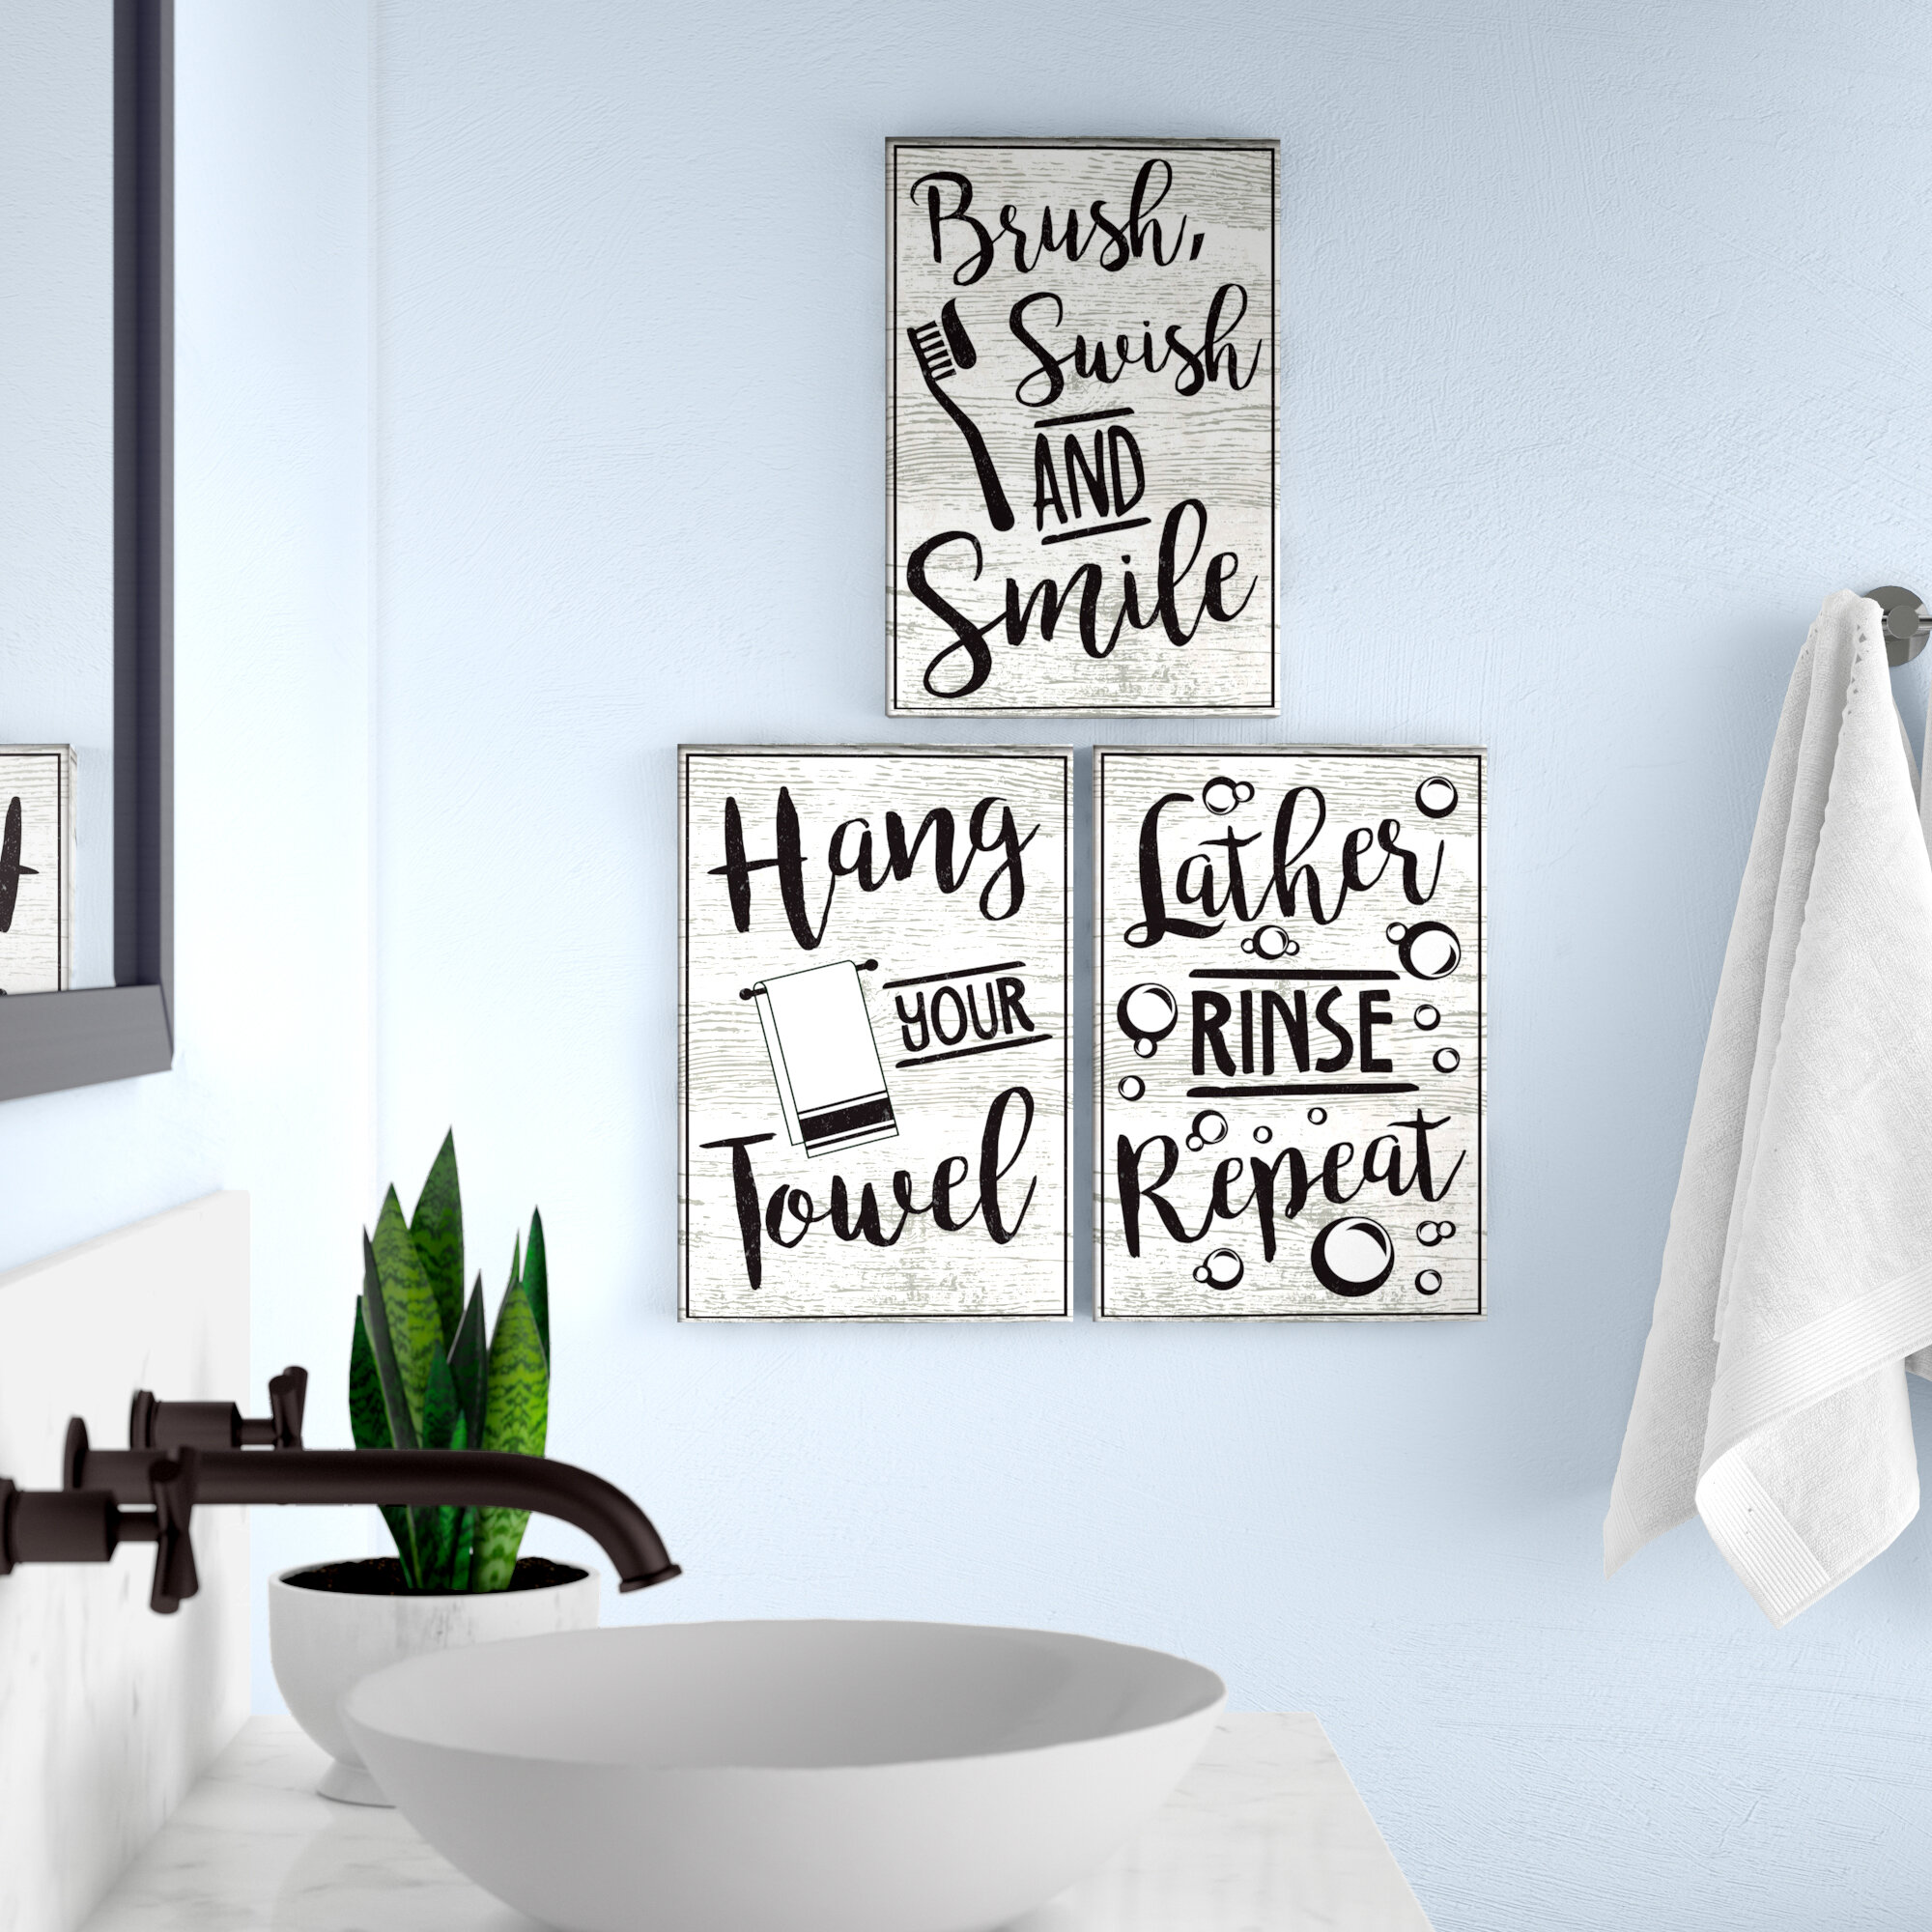 Winston Porter Lather Rinse Repeat Hang Your Towel And Brush Swish Smile 3 Piece Textual Art Set Reviews Wayfair